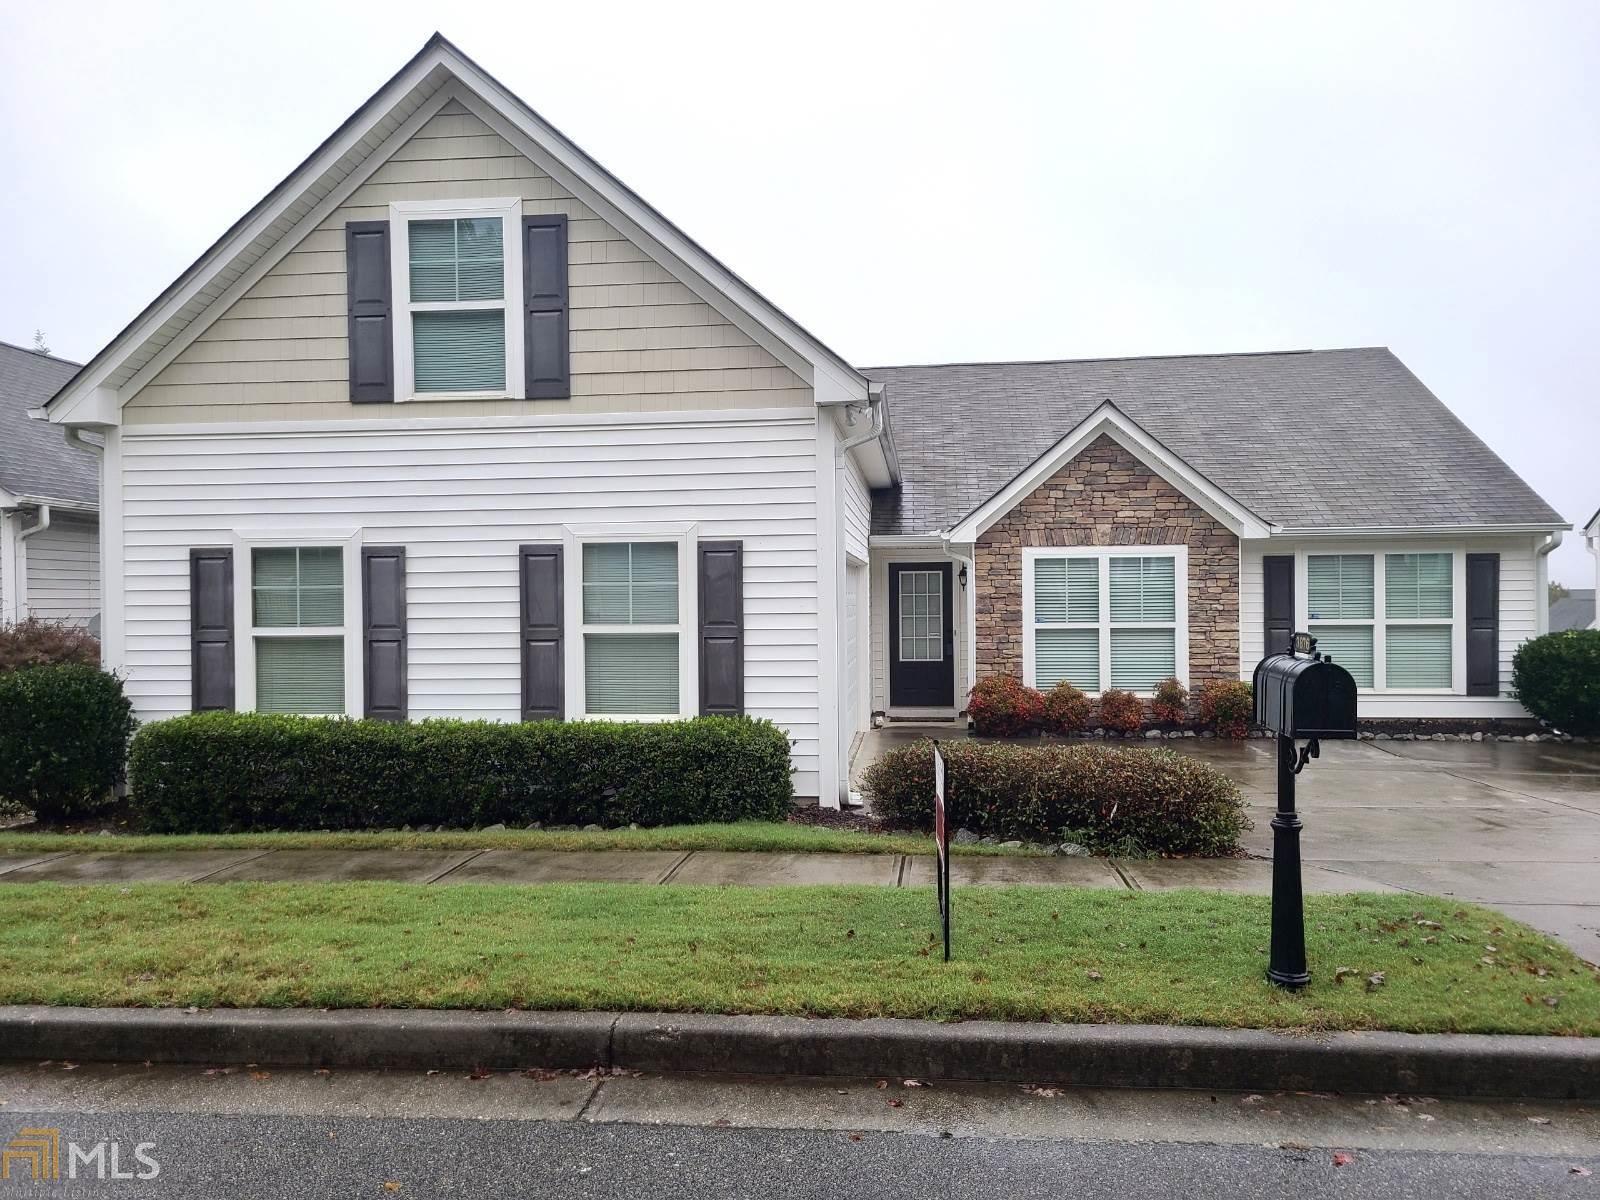 3876 Pine Village Pl, Loganville, GA 30052 - MLS#: 8880575